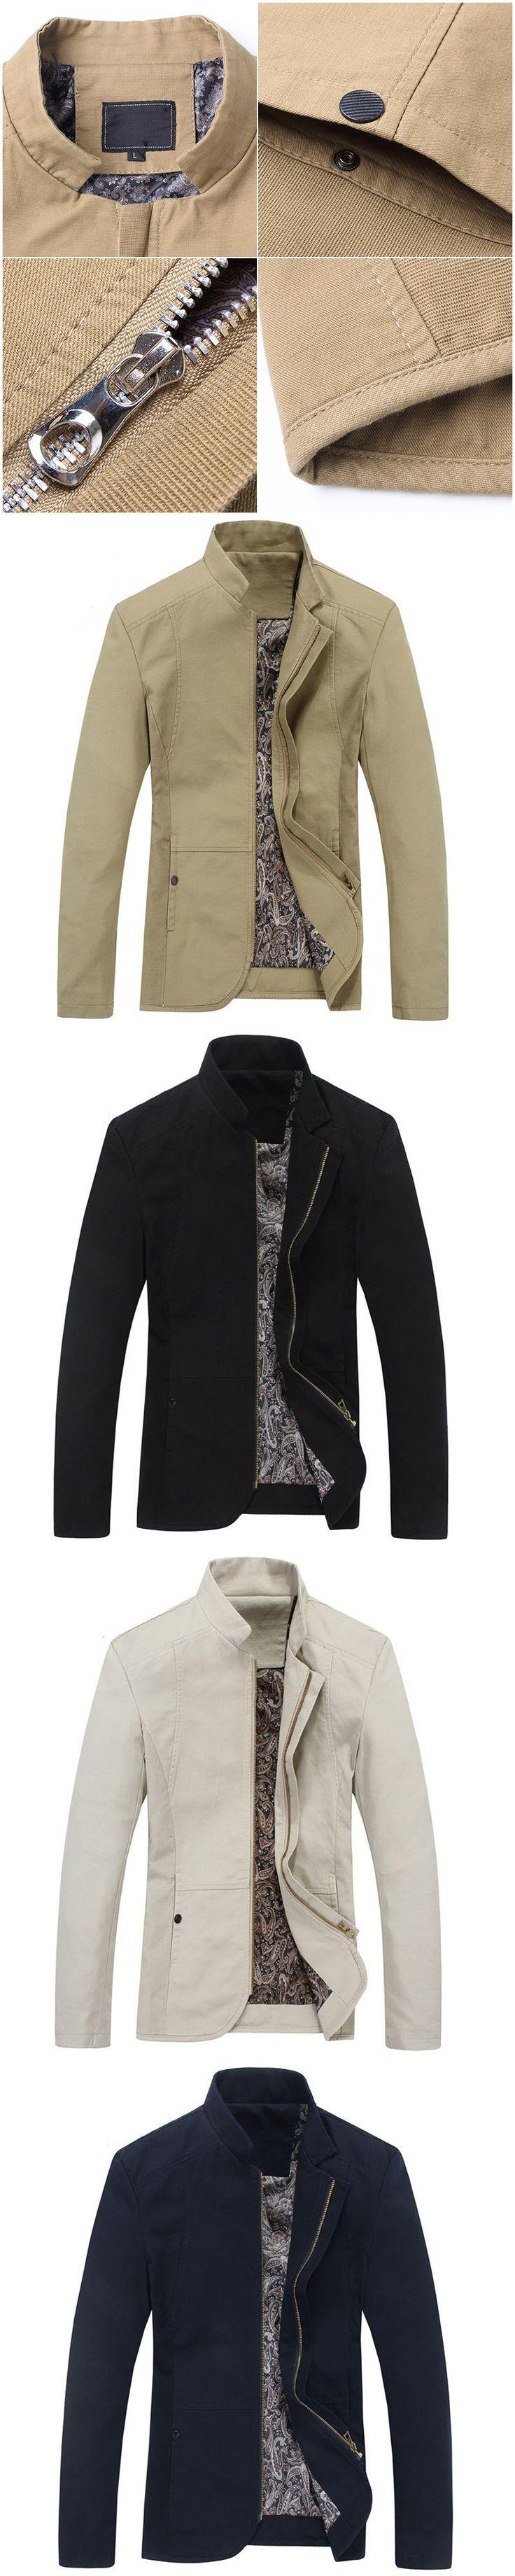 NATAZH Men's Fashion Casual Jacket Brand New Man Spring Mandarin Collar Jacket Autumn Male Outwear Plus Size